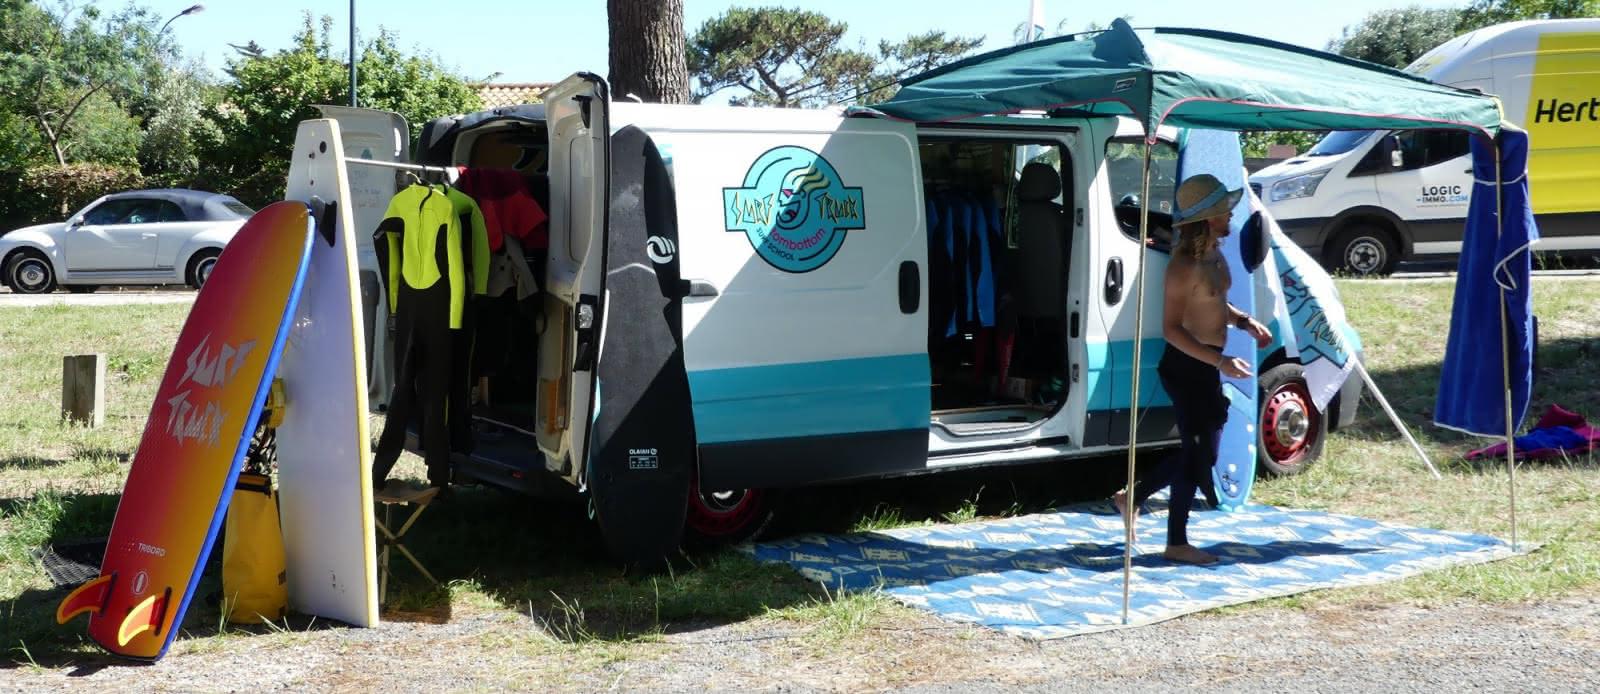 Tombottom Surf Truck 1